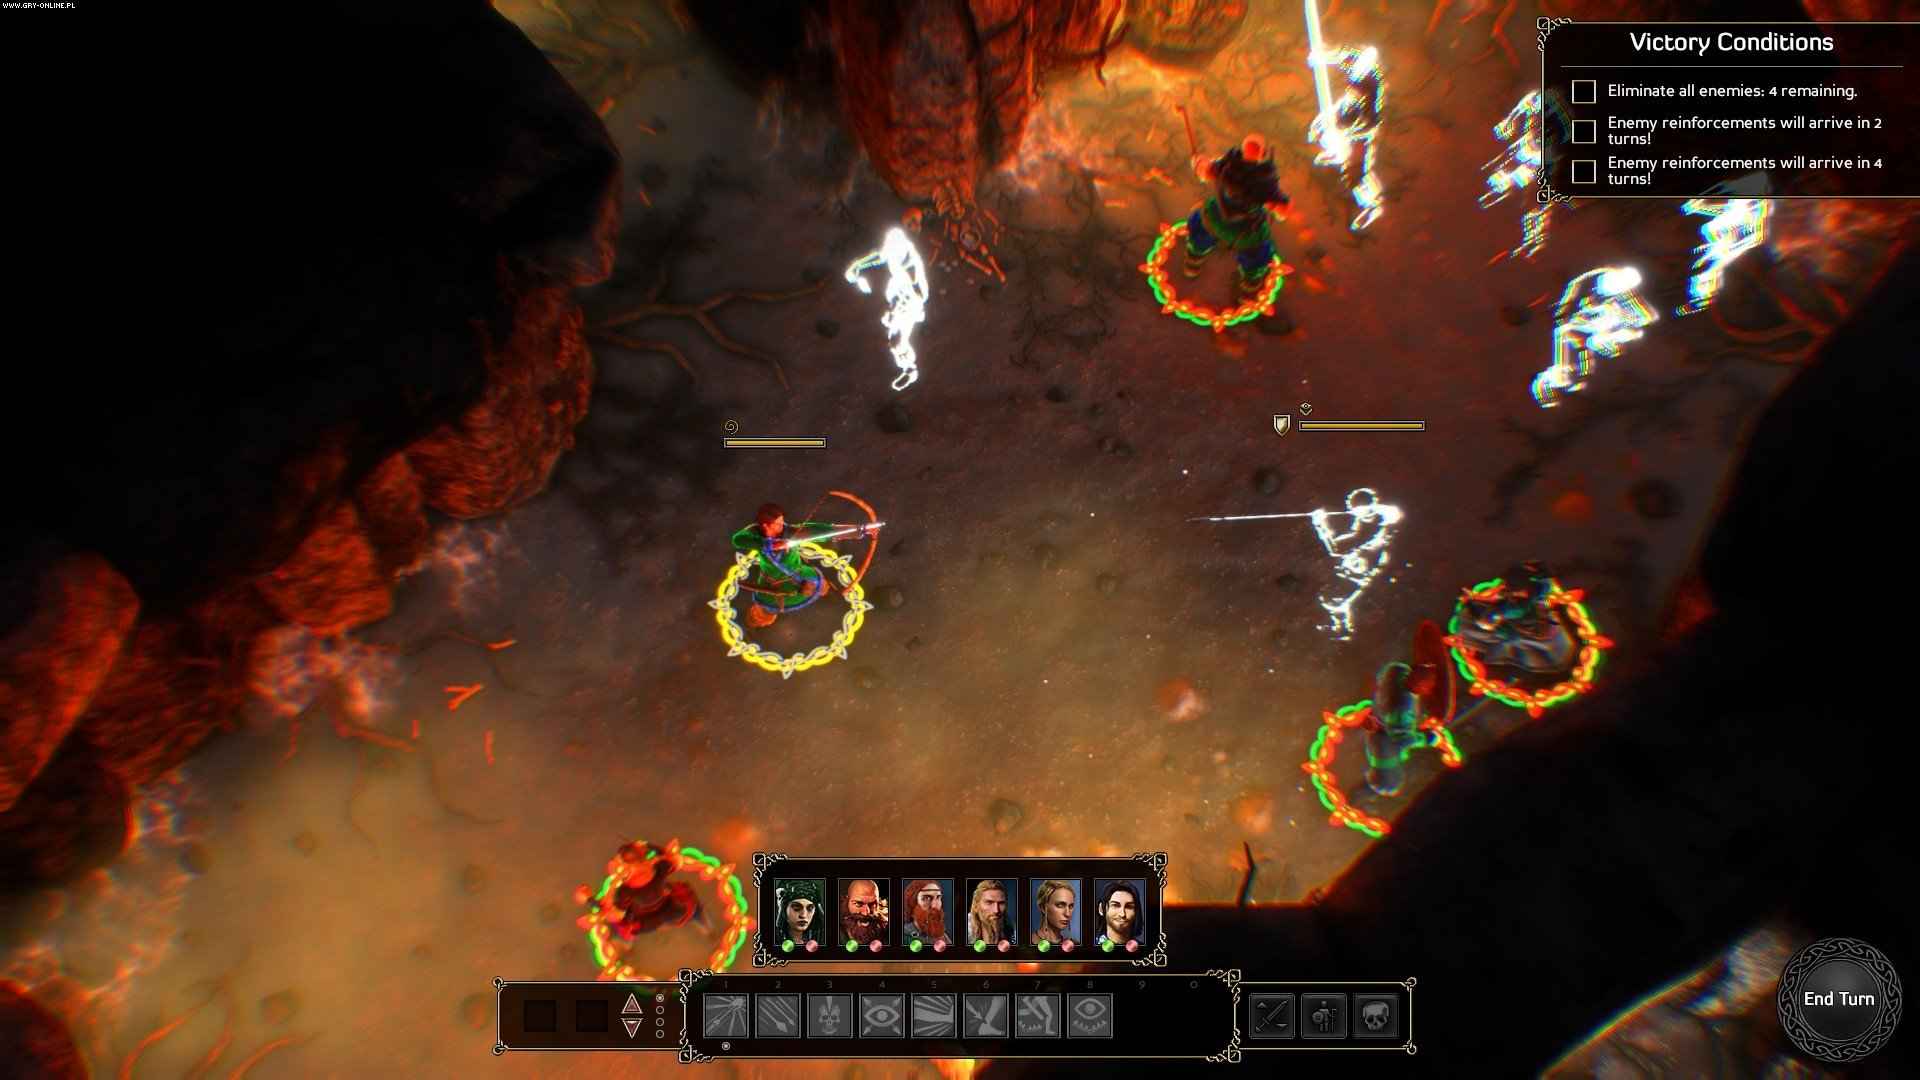 Expeditions: Viking PC Games Image 8/26, Logic Artists, IMGN.PRO